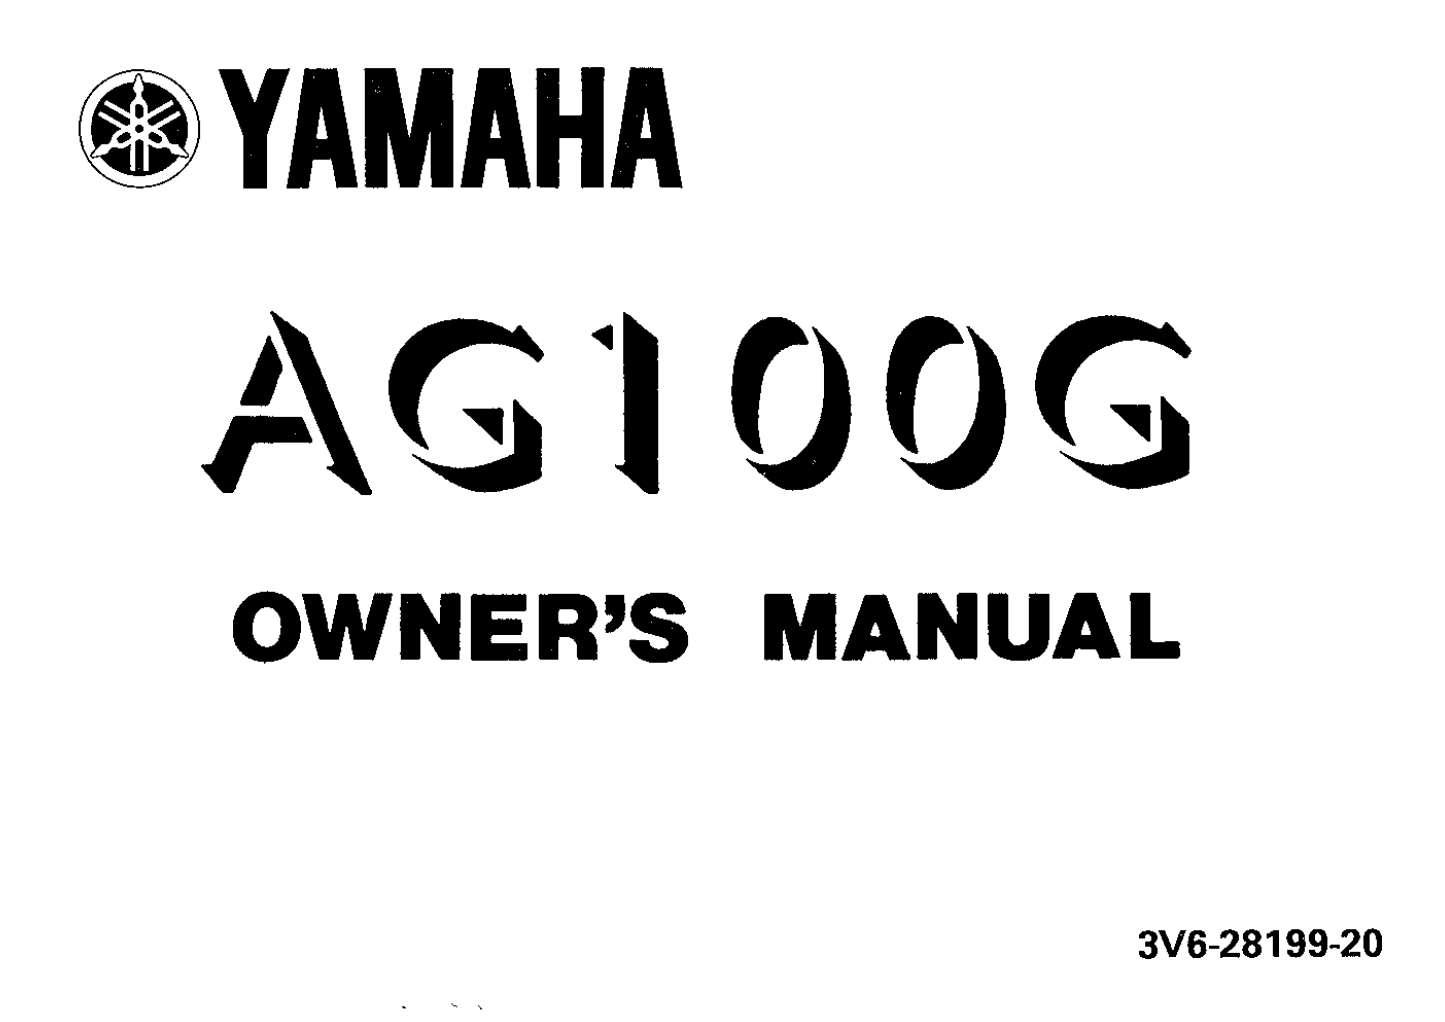 Yamaha AG100 G Owner's Manual